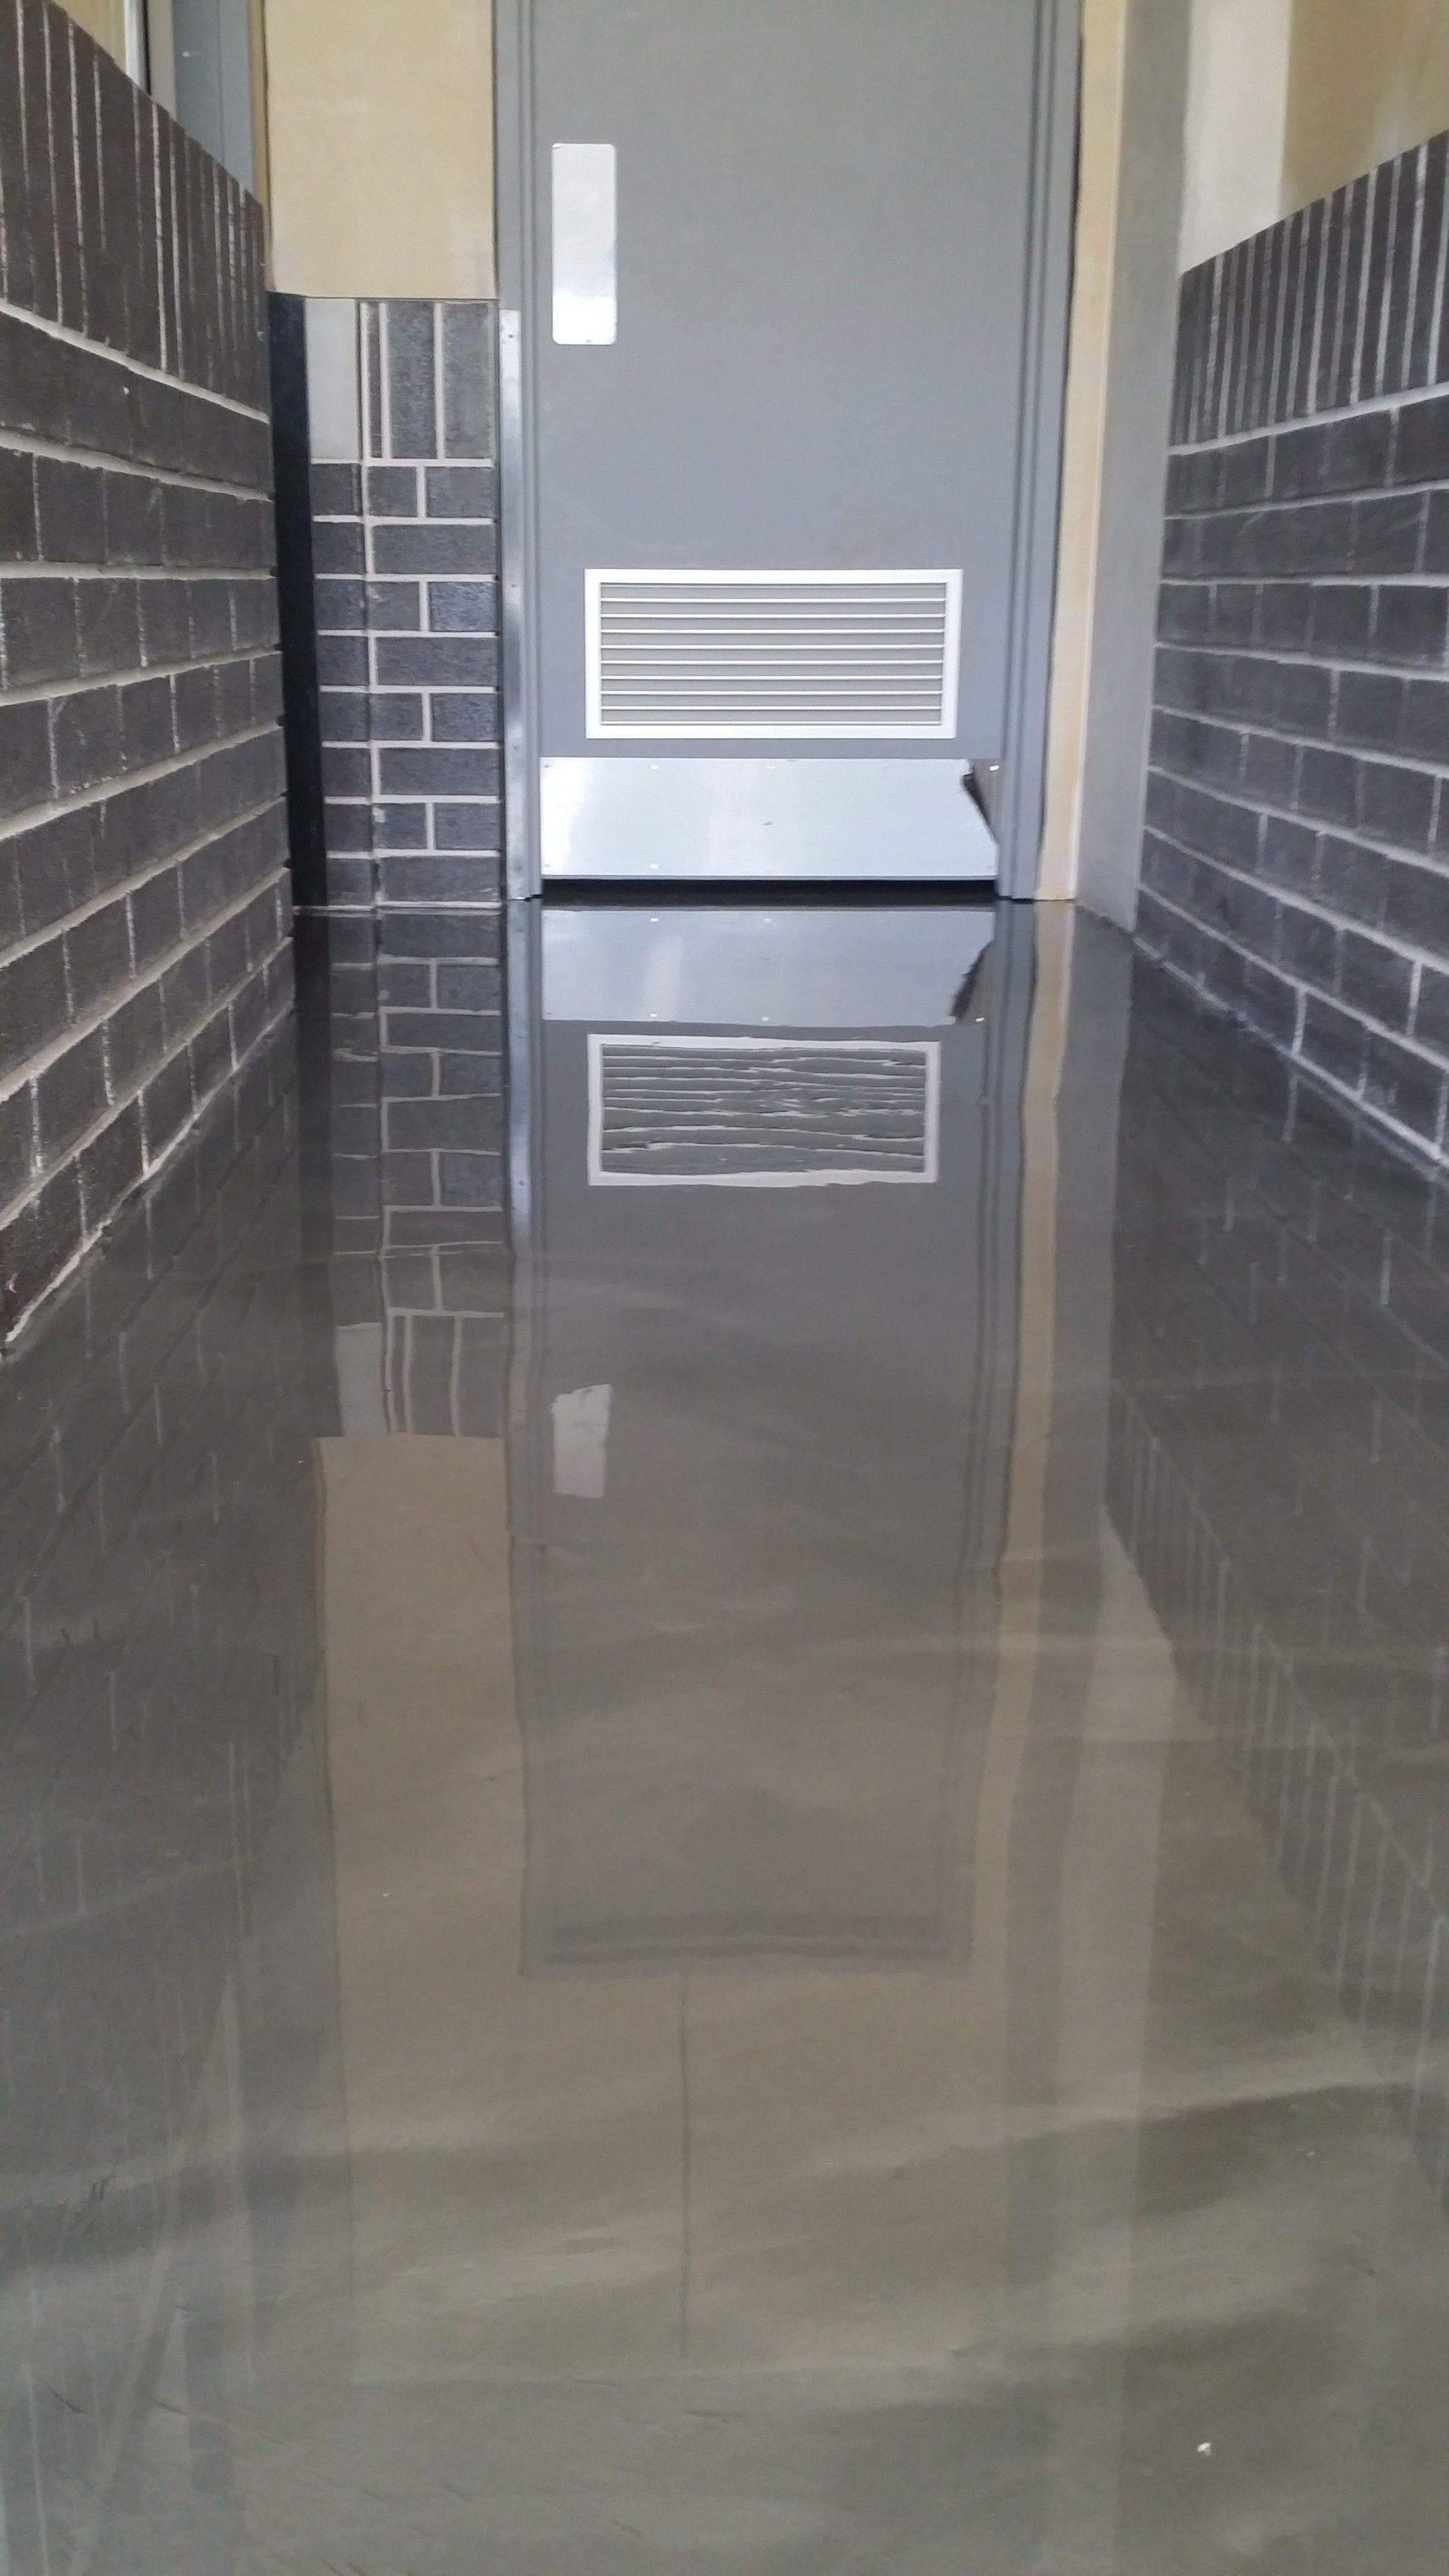 Childcare Centre Toilet Entry Area Epoxy Flooring Cost Flooring Cost Epoxy Floor Designs